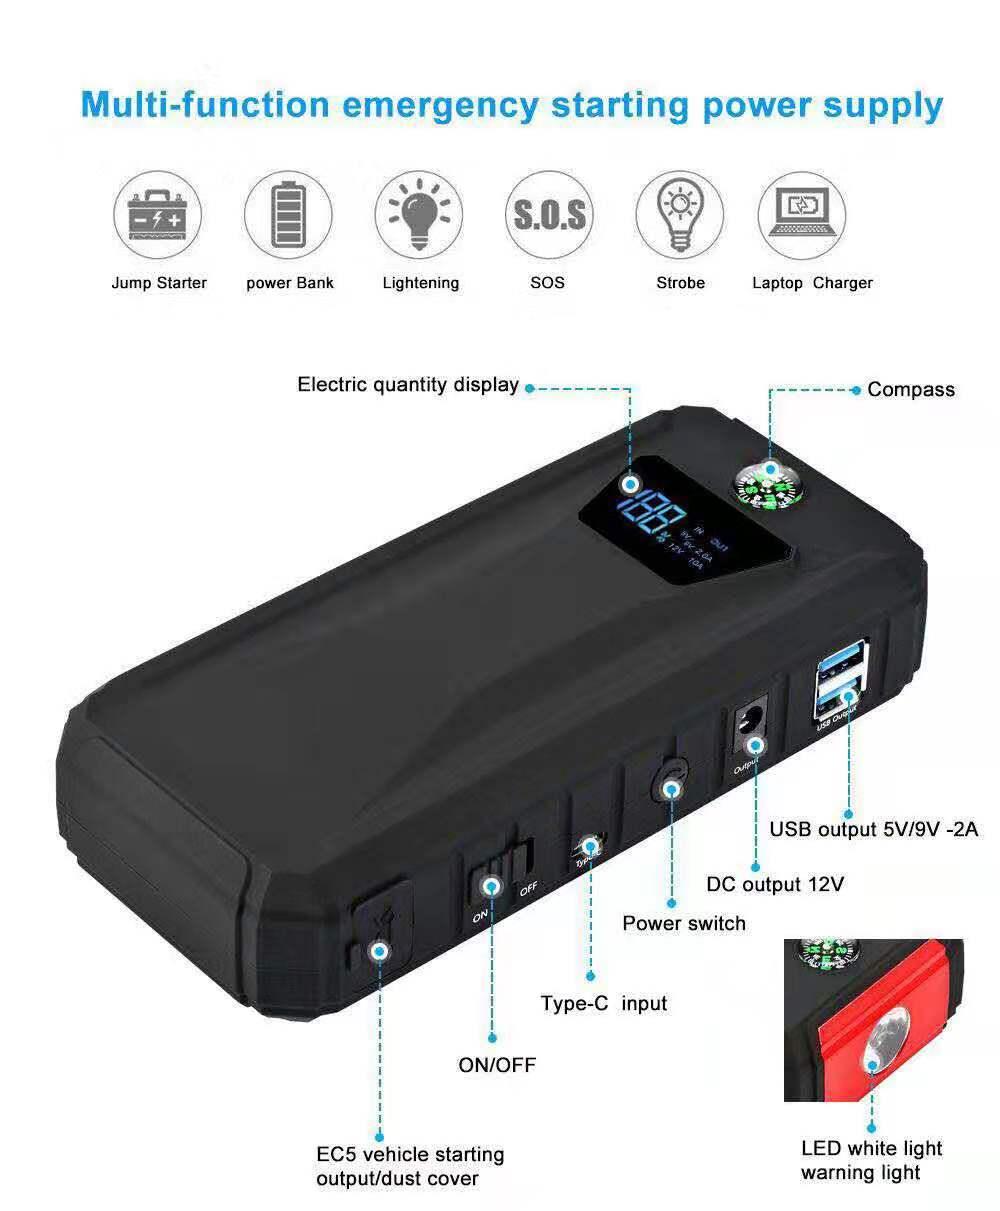 18000mAh1000A 1200A super potencia portátil multifunción coche batería booster carga rápida smartphone USB